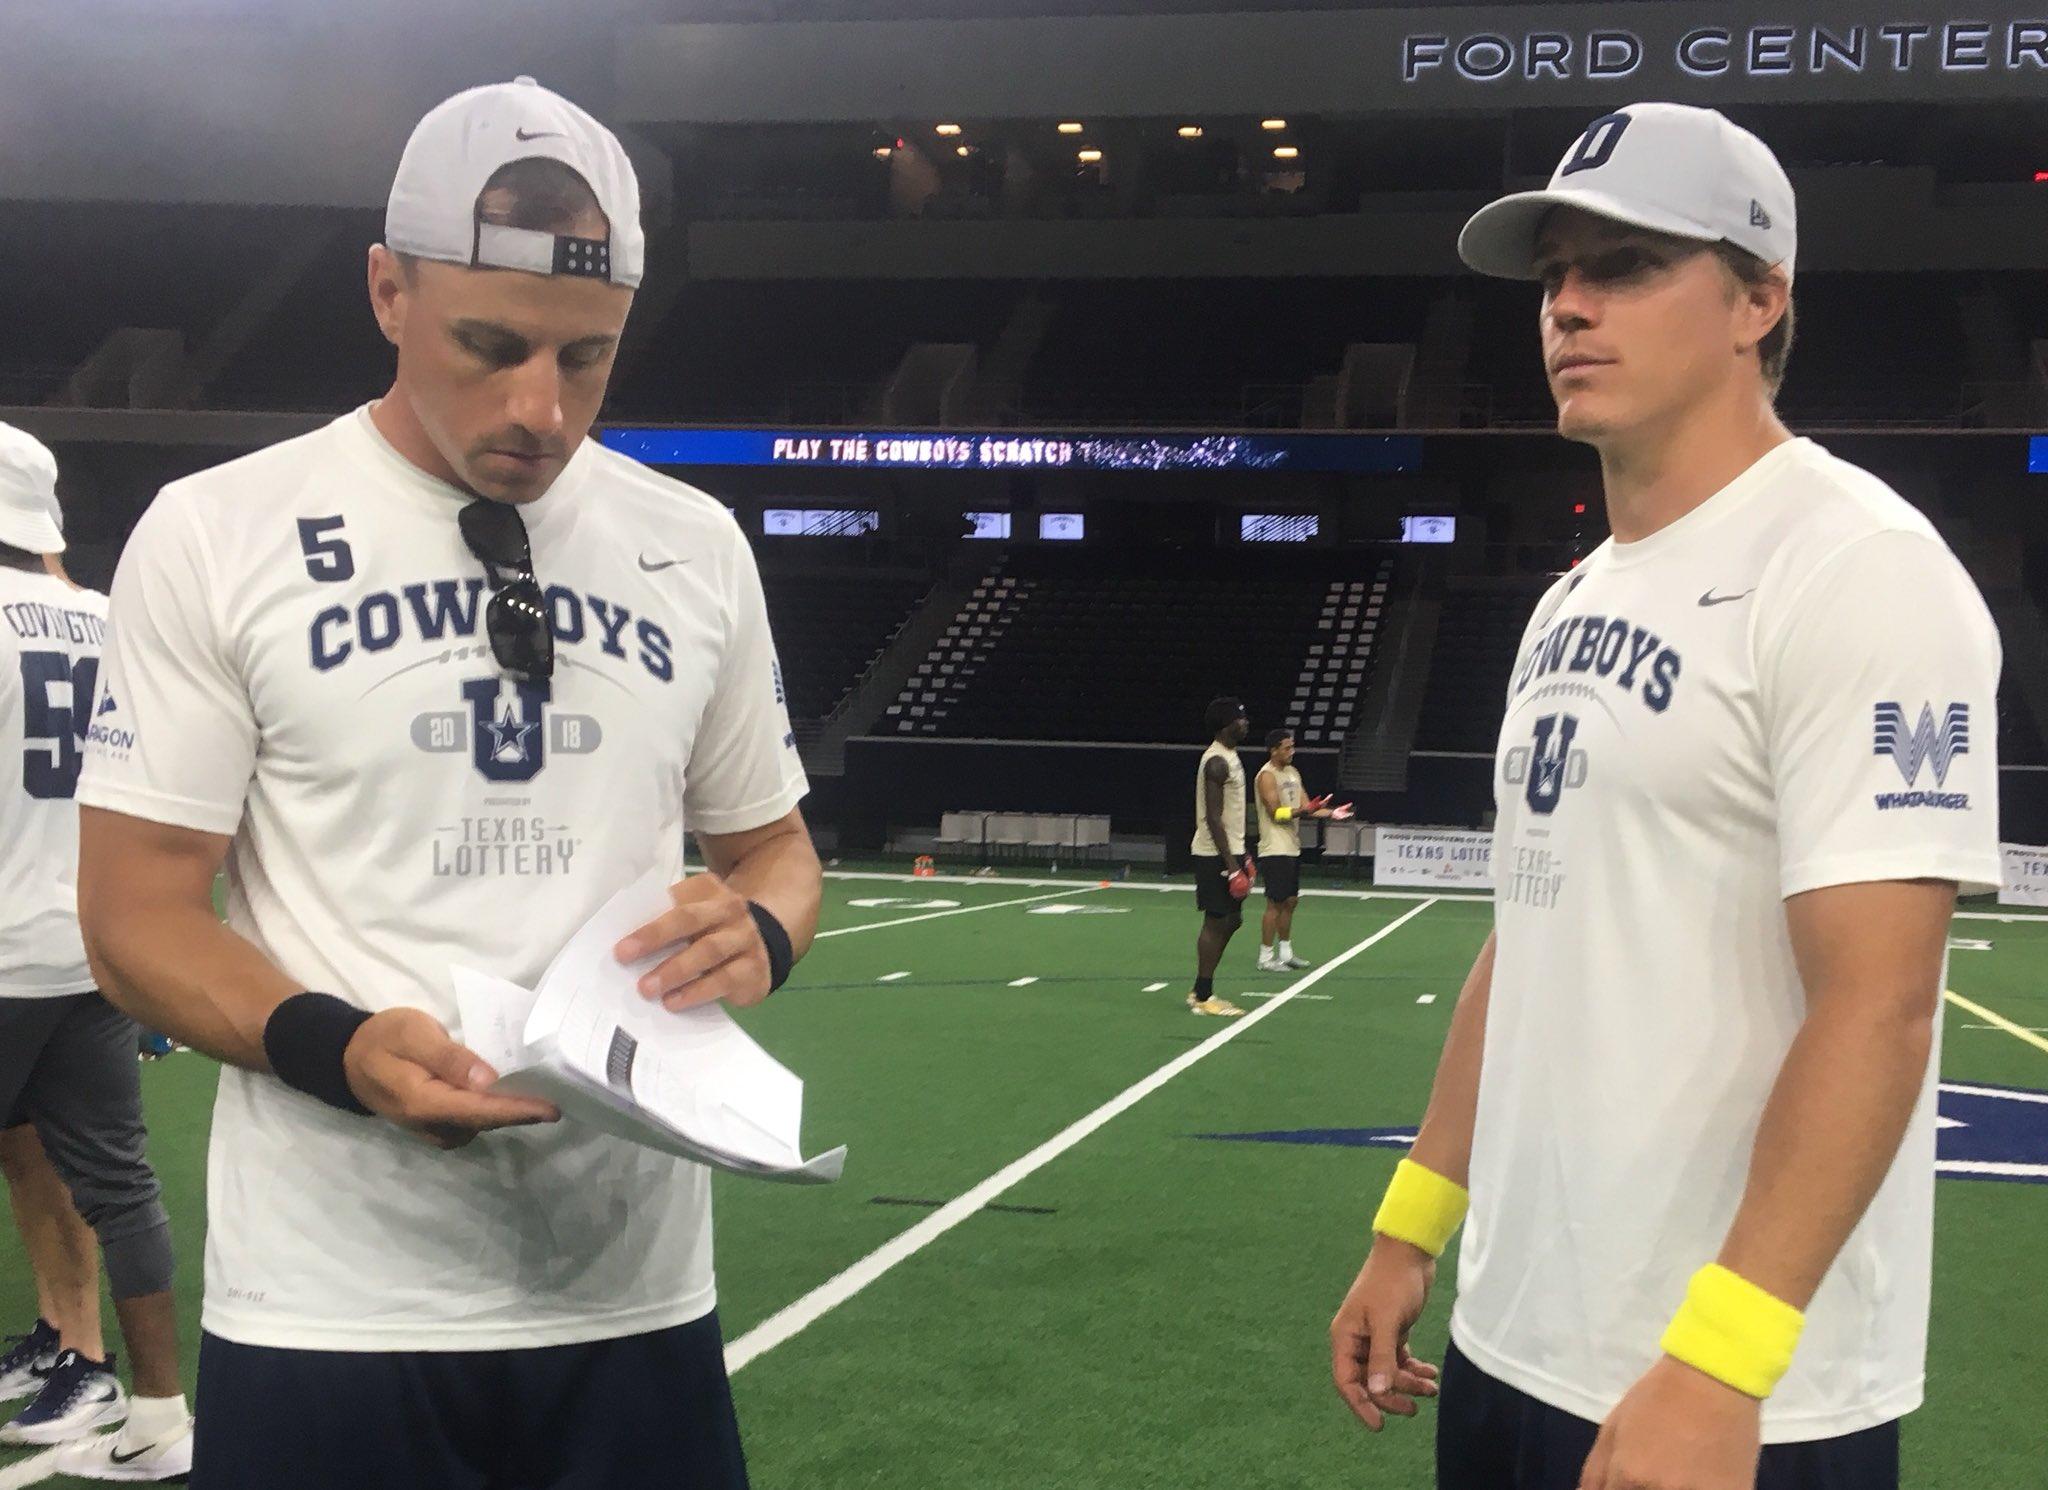 #CowboysU @TexasLottery Championship Game ➡️ Team Dan Bailey vs. Team Chris Jones https://t.co/gLUhWmT05y